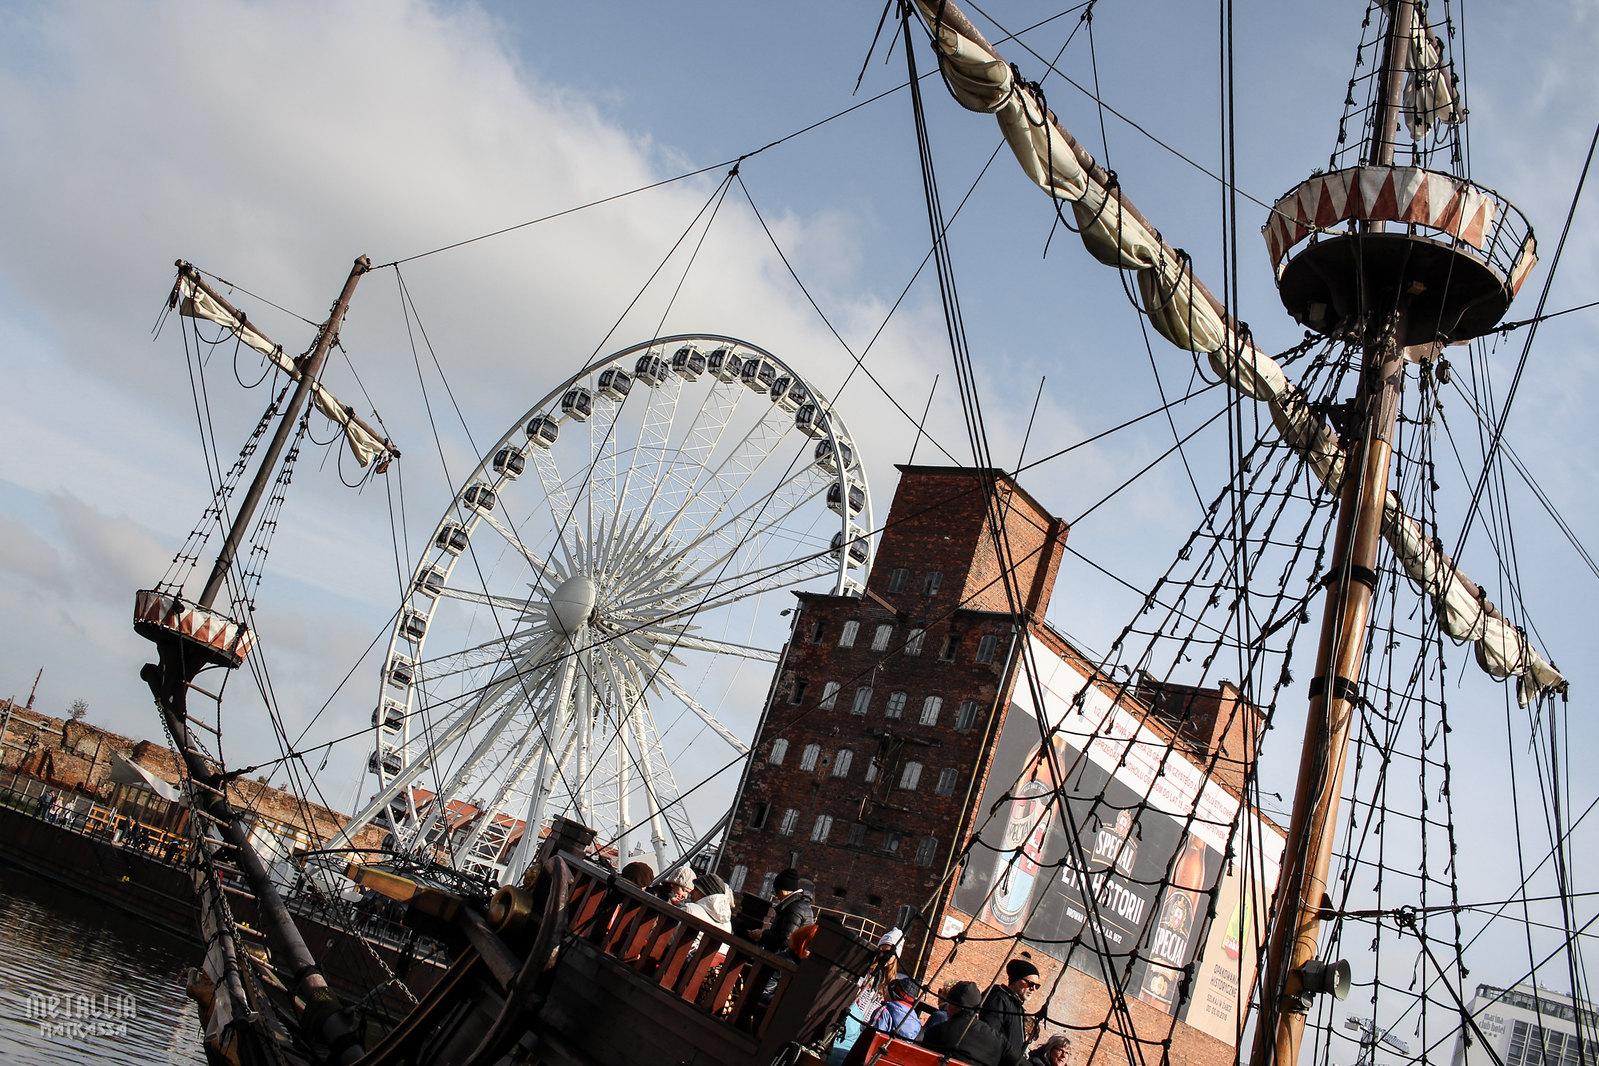 gdansk, gdanskin vanha kaupunki, gdansk old town, gdansk stare miasto, amber sky, gdansk eye